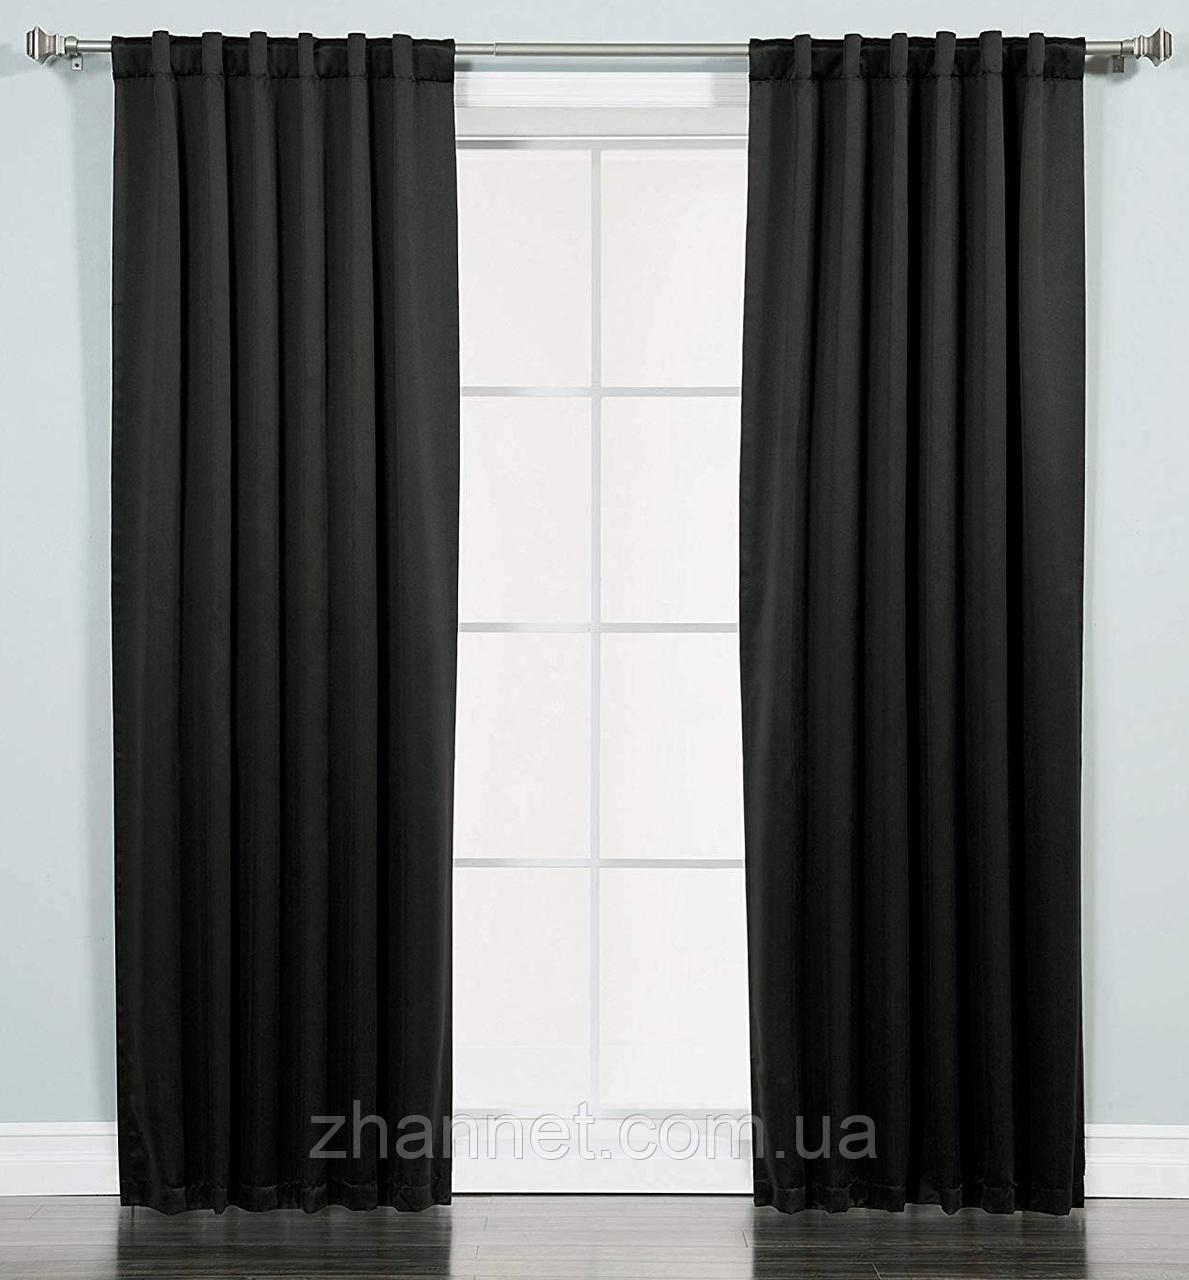 Комплект Штор Блекаут чёрный (150813215)